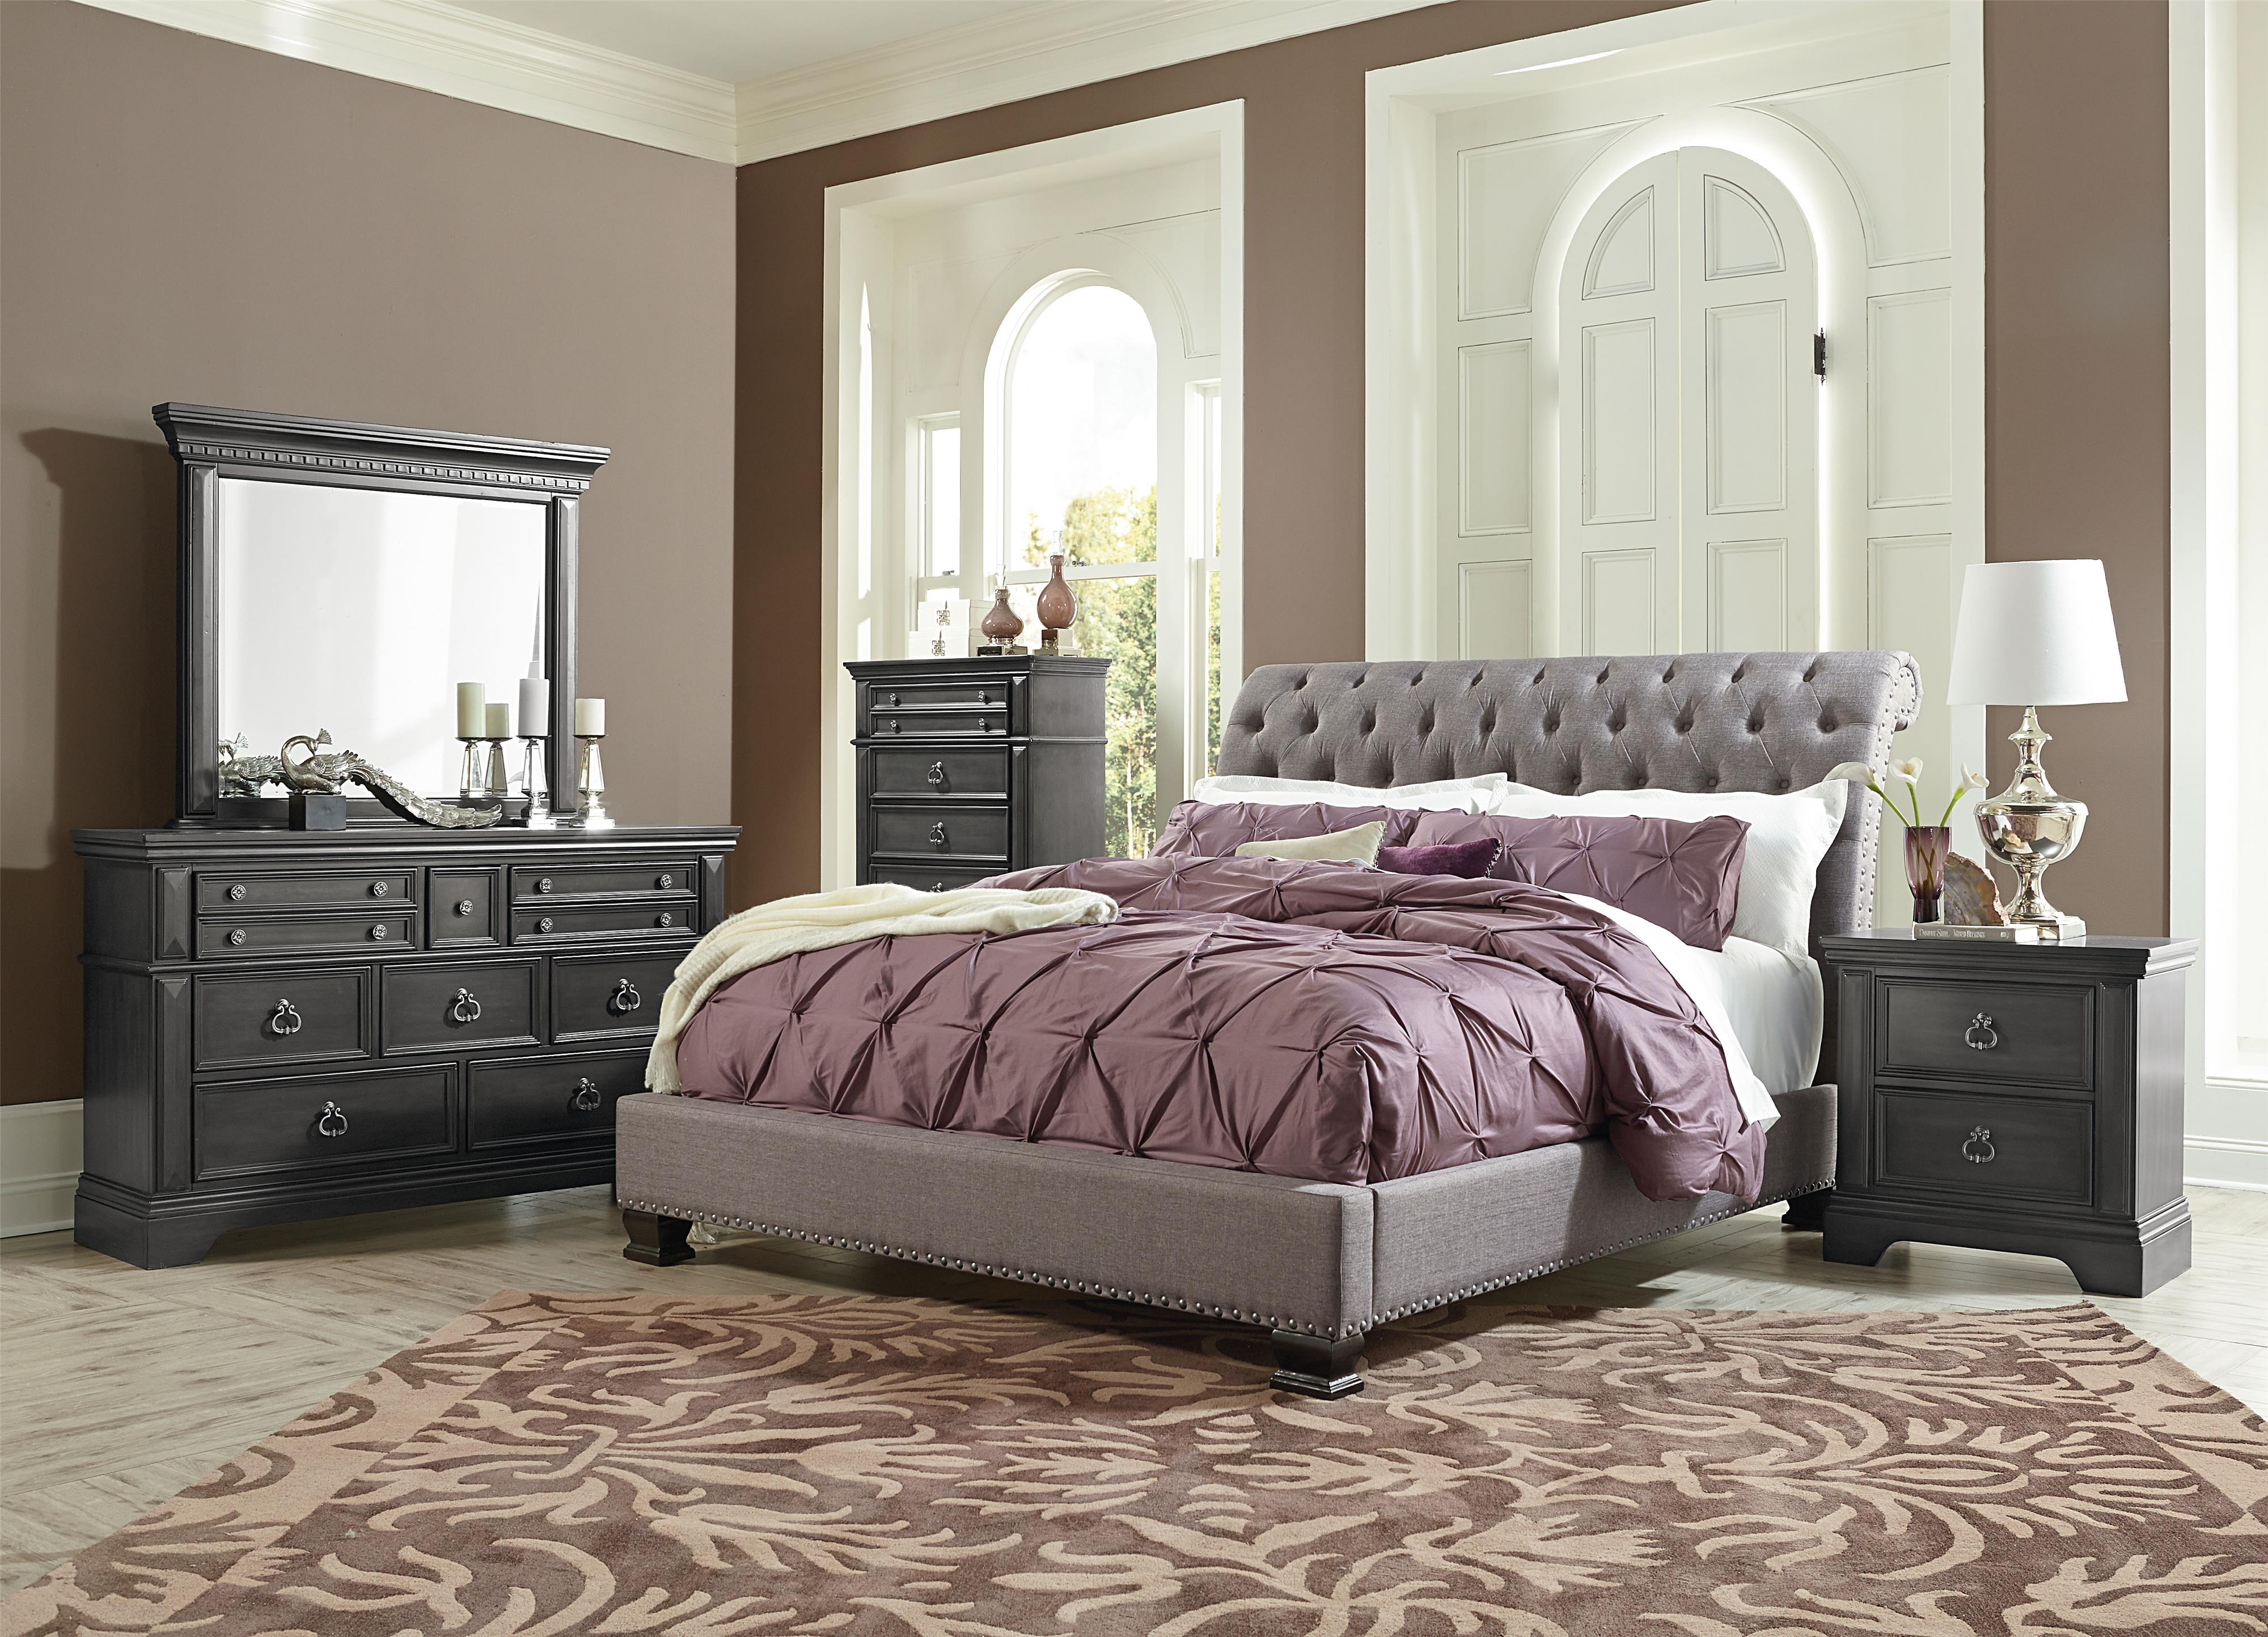 Standard Furniture Garrison Queen Traditional Upholstered Bed   Wayside  Furniture   Upholstered Beds